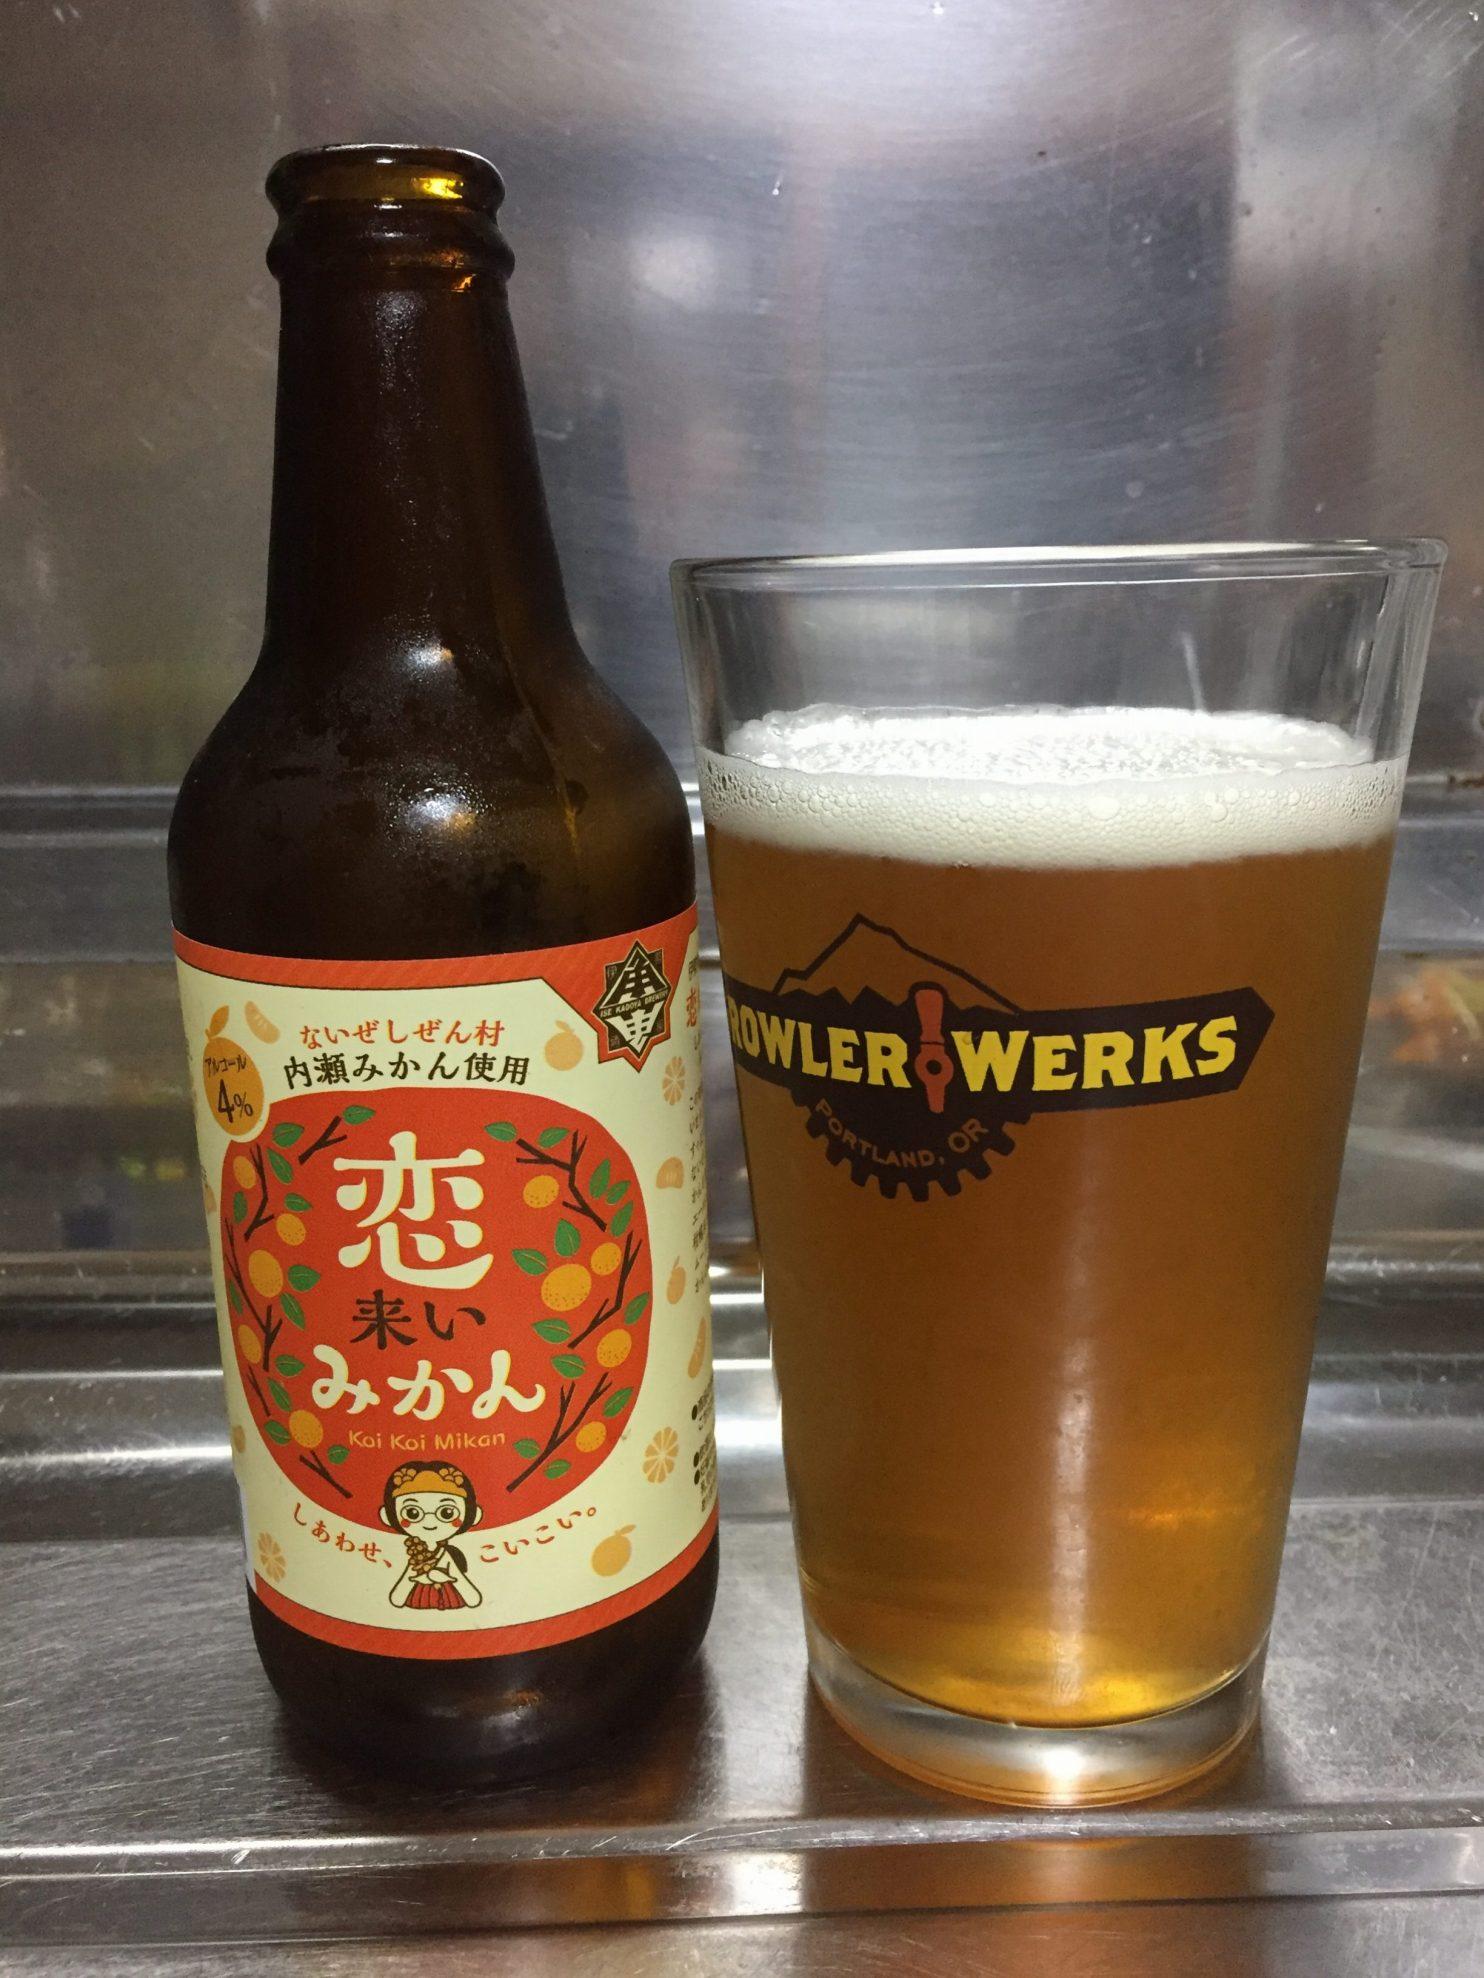 Koi koi mikan 恋来いみかんビール